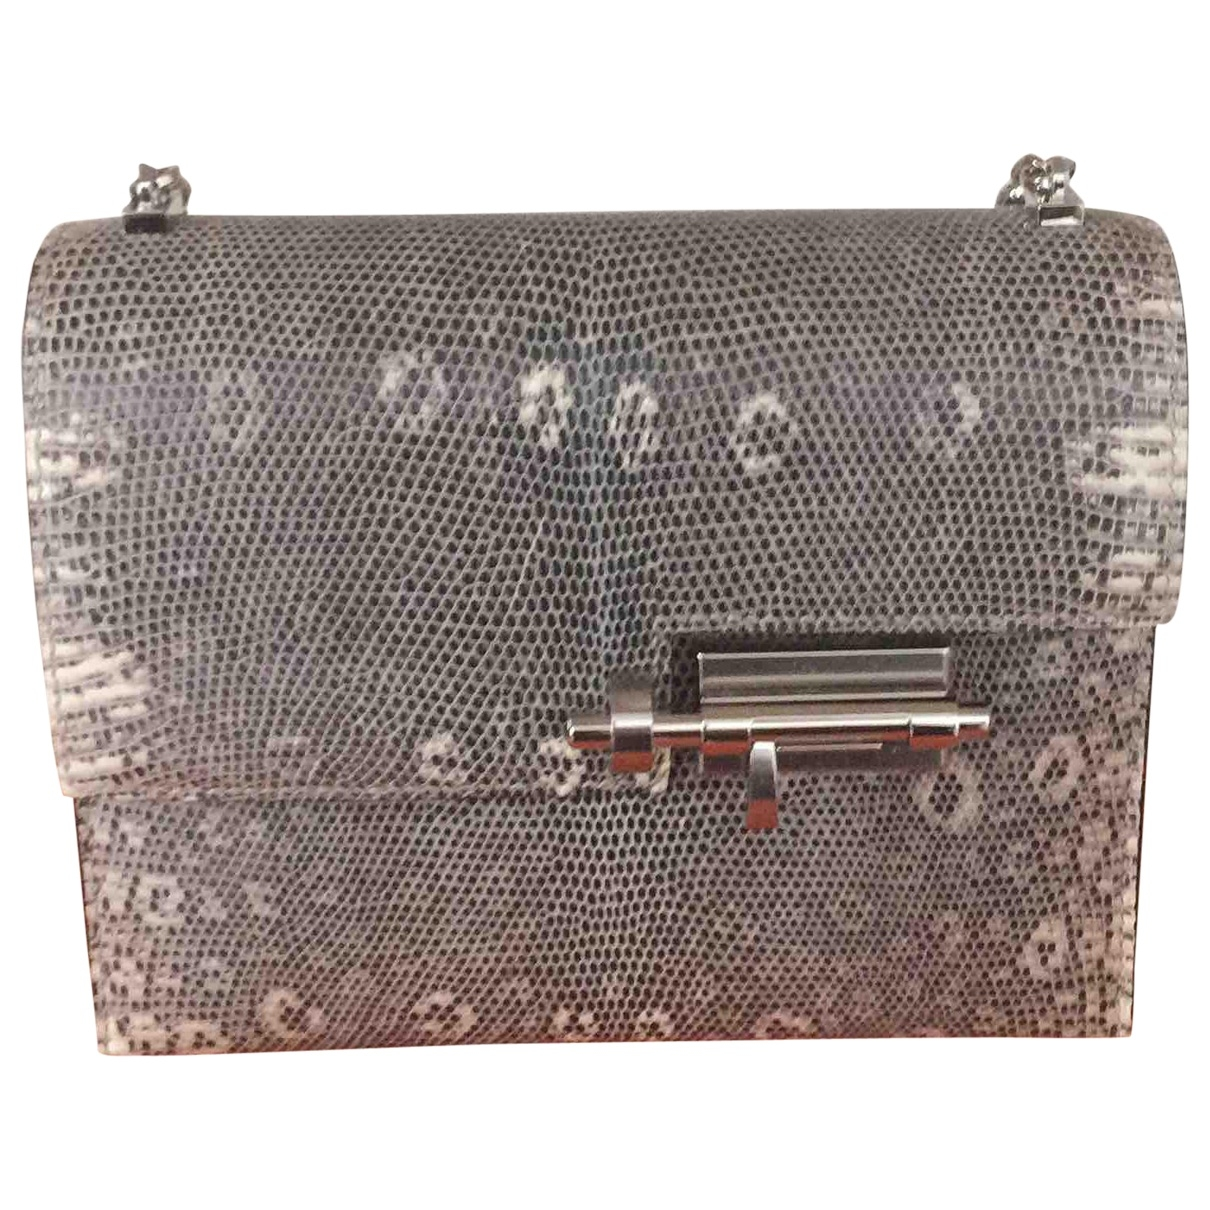 Hermès Verrou Lizard Clutch bag for Women \N